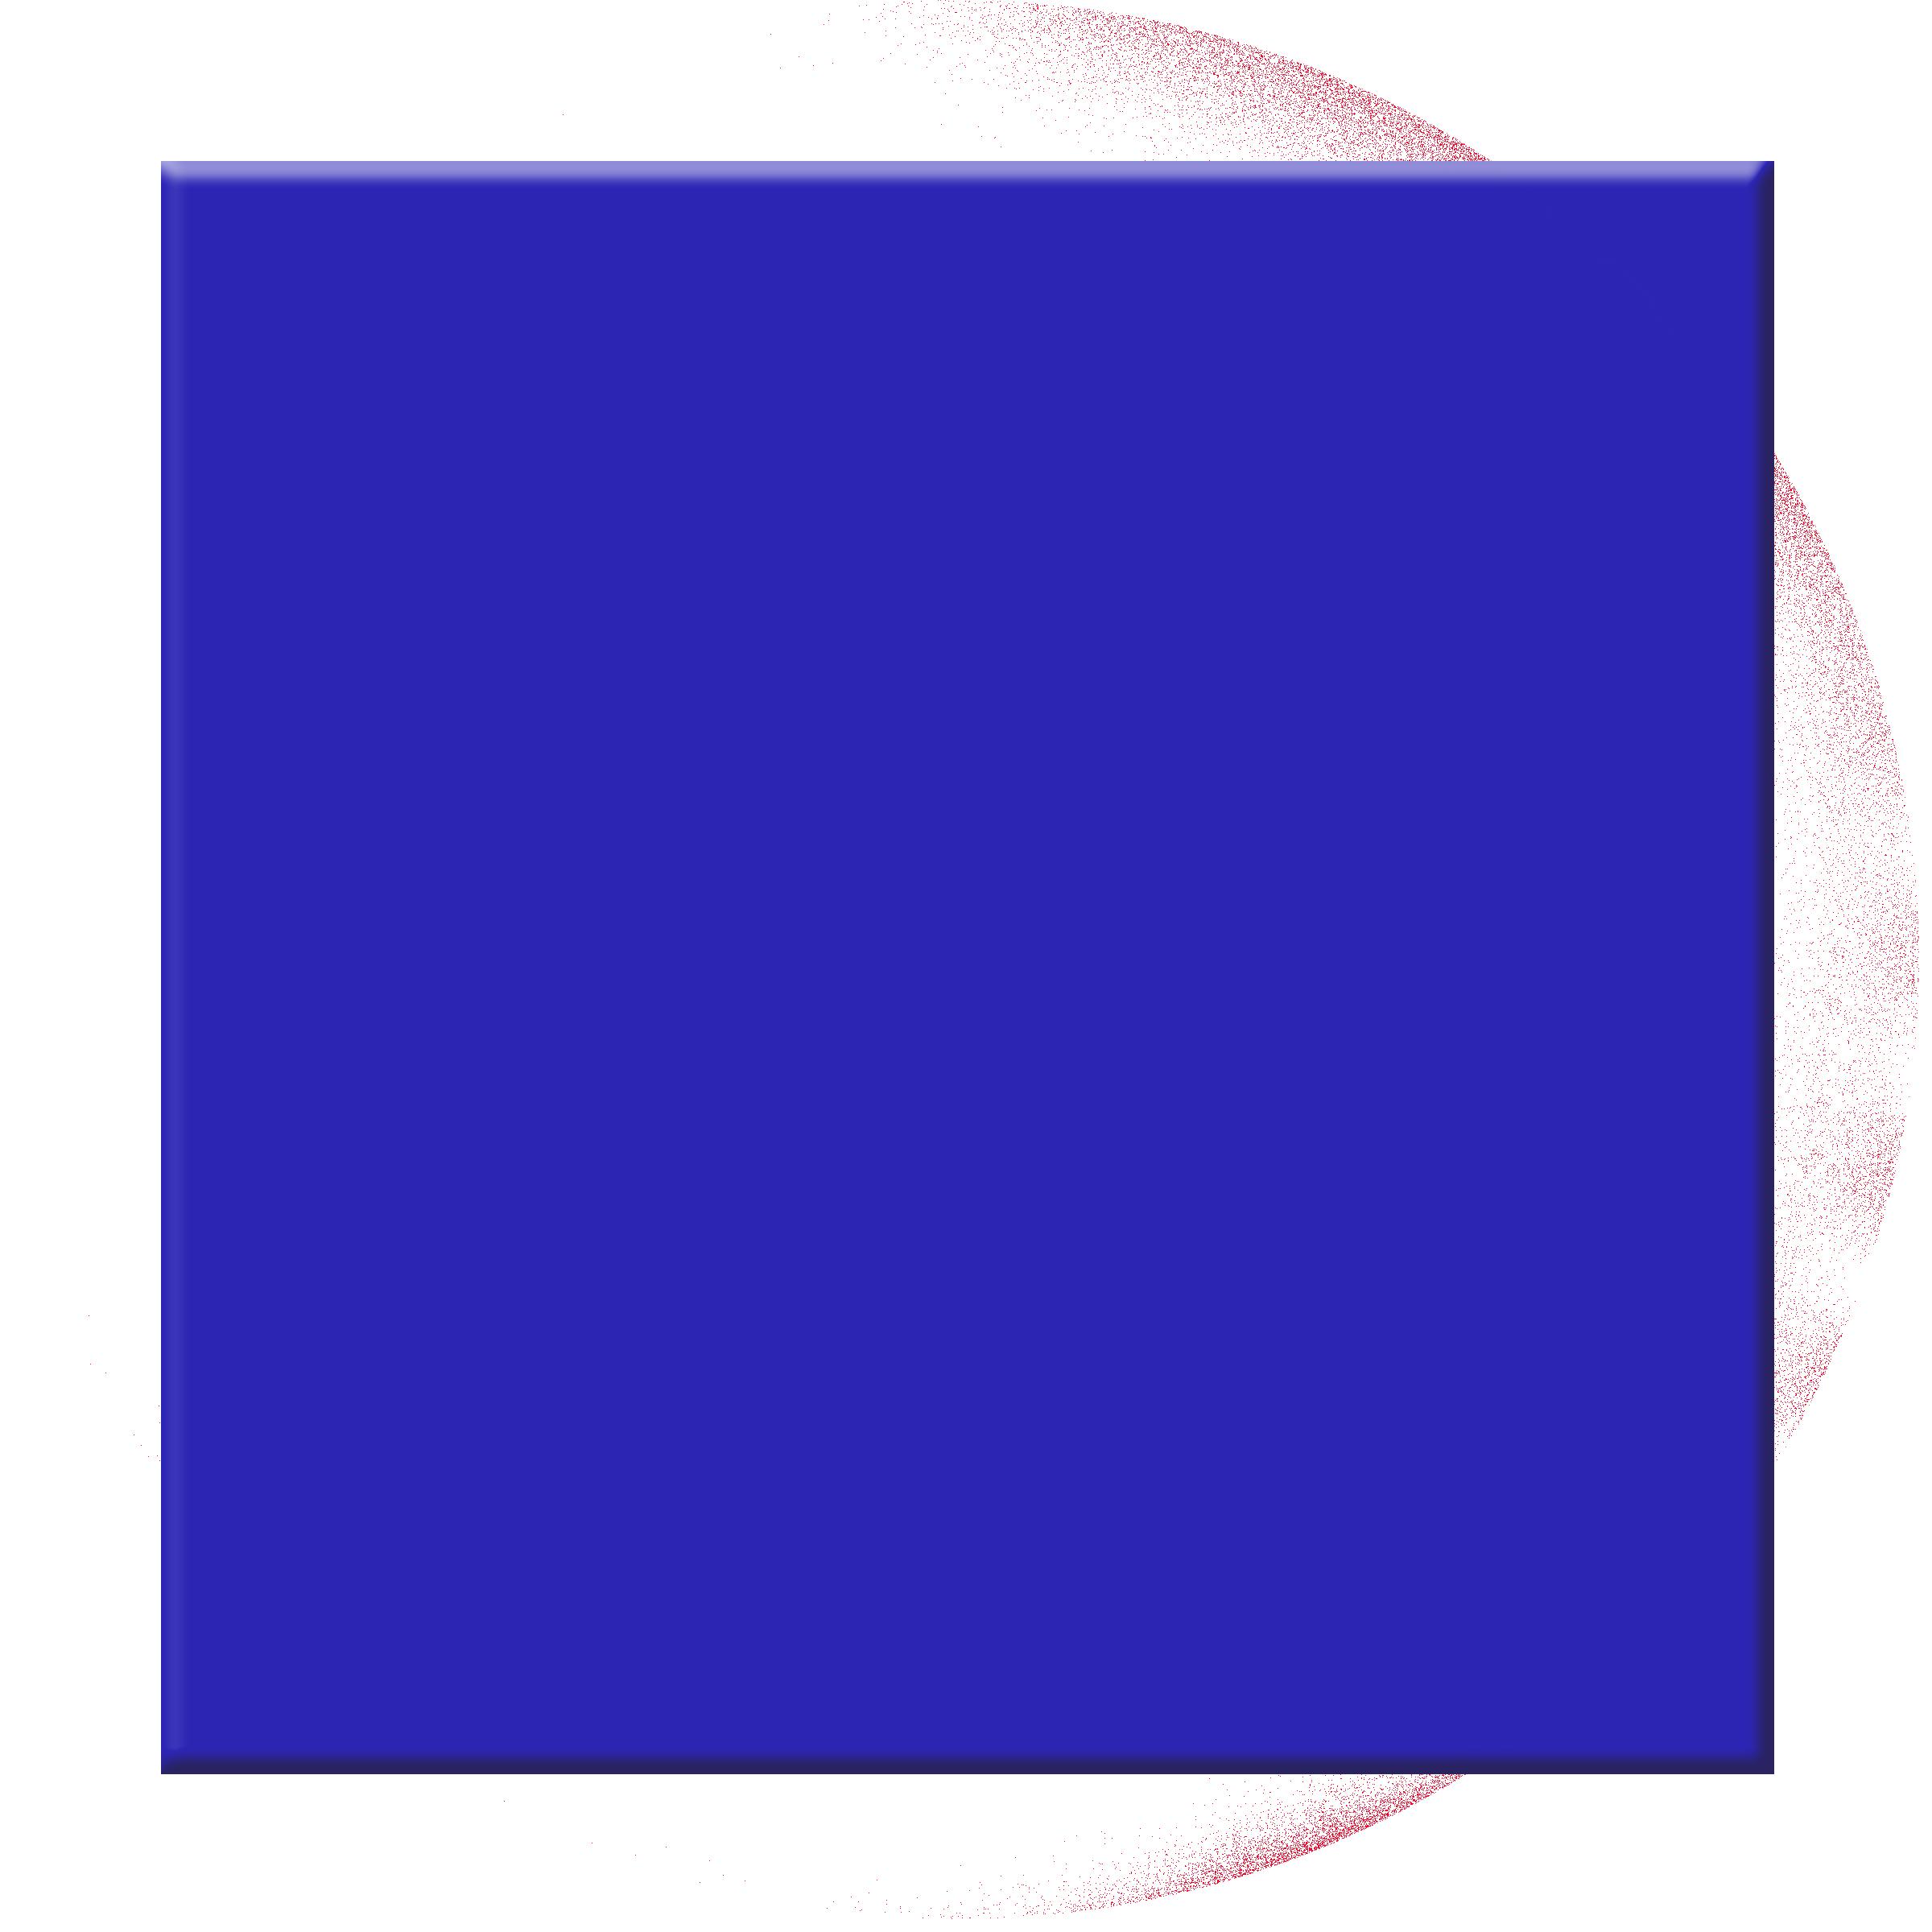 Free Blue Square Cliparts, Download Free Clip Art, Free Clip.